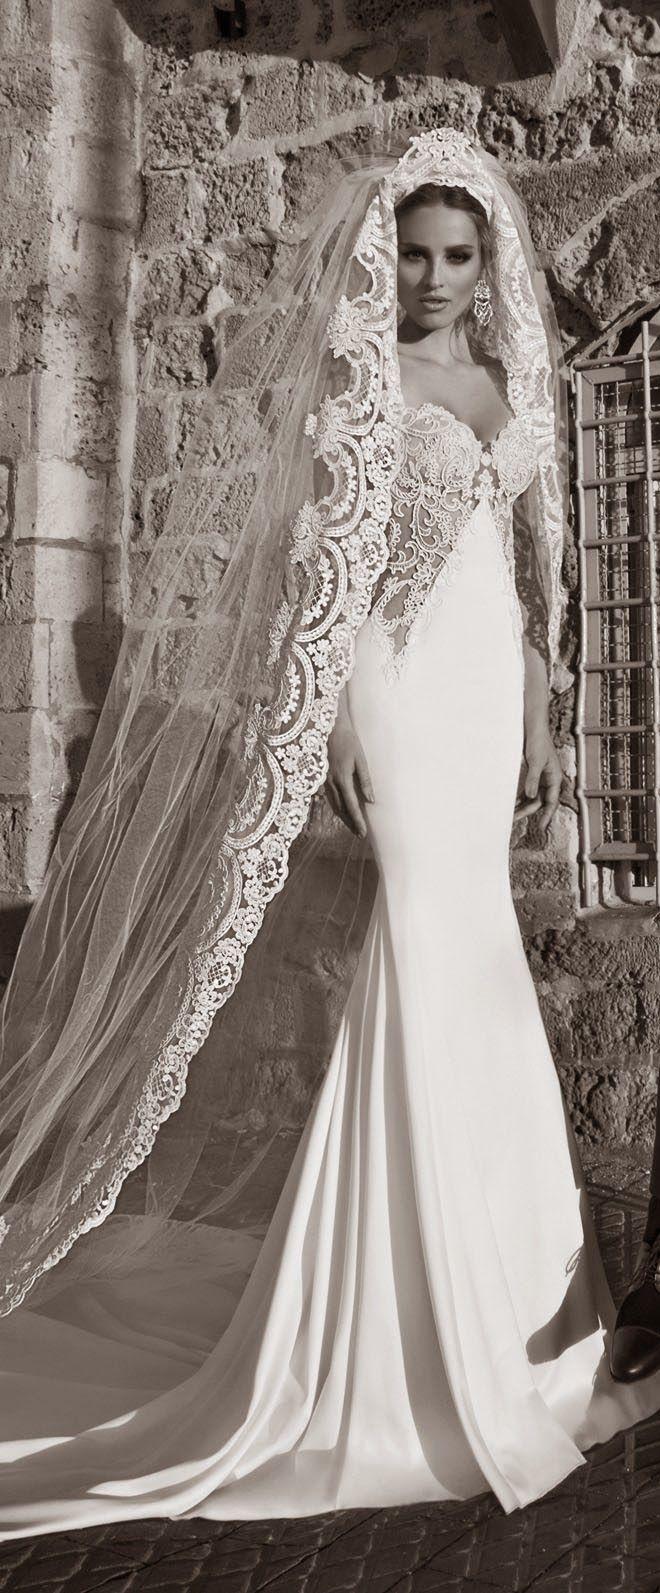 Best Of Galia Lahav Wedding Dresses Modwedding Galia Lahav Wedding Dress Bridal Dresses Wedding Dresses